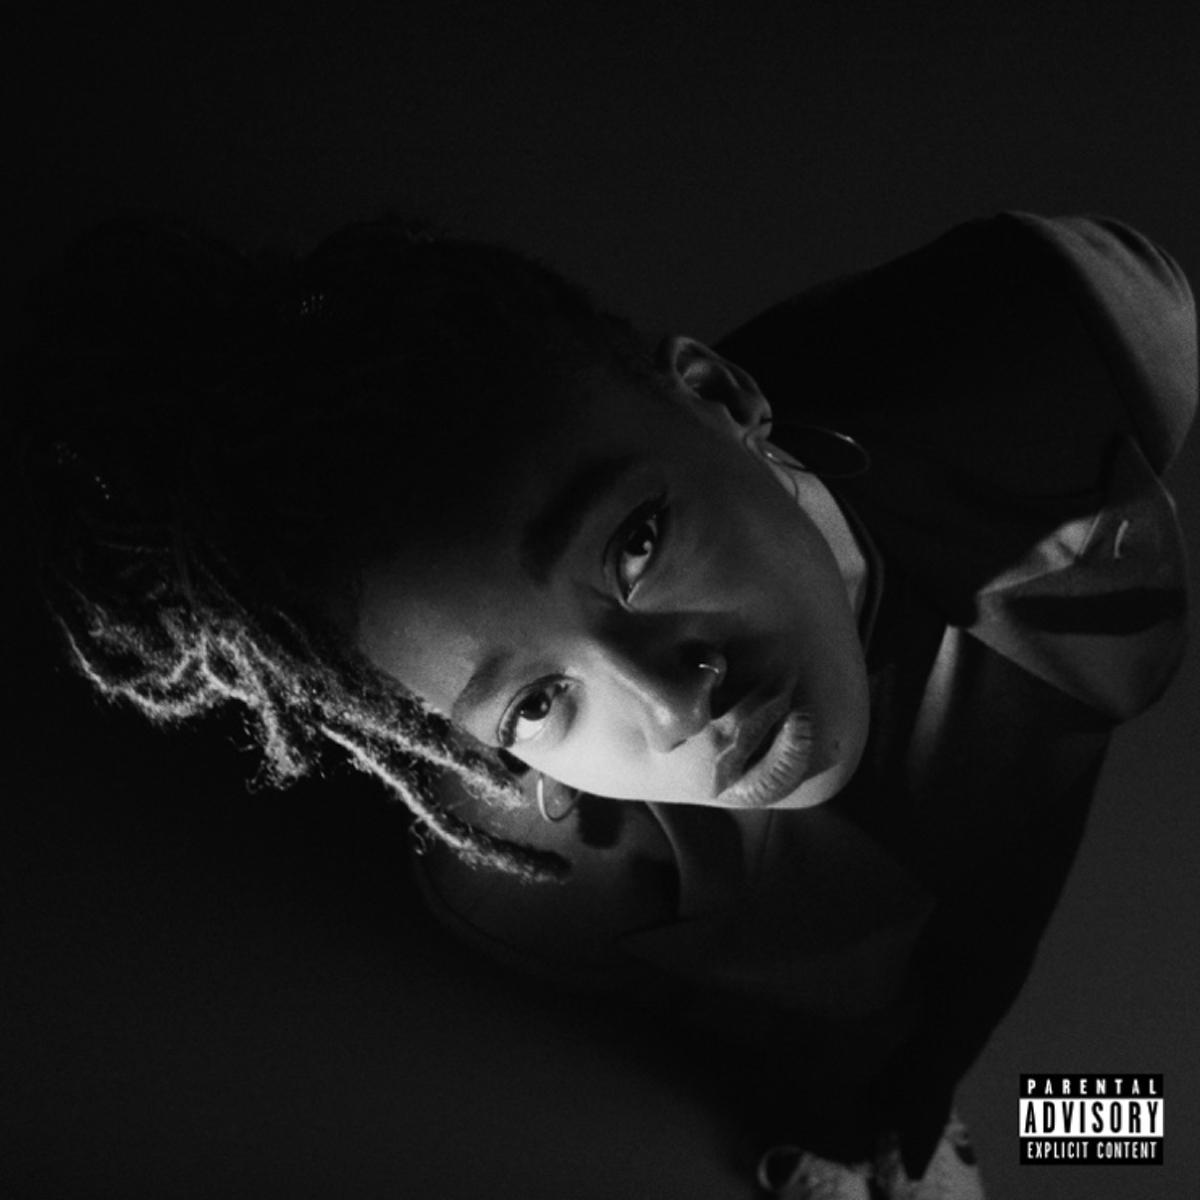 UK rapper Little Simz returns with new album Grey Area